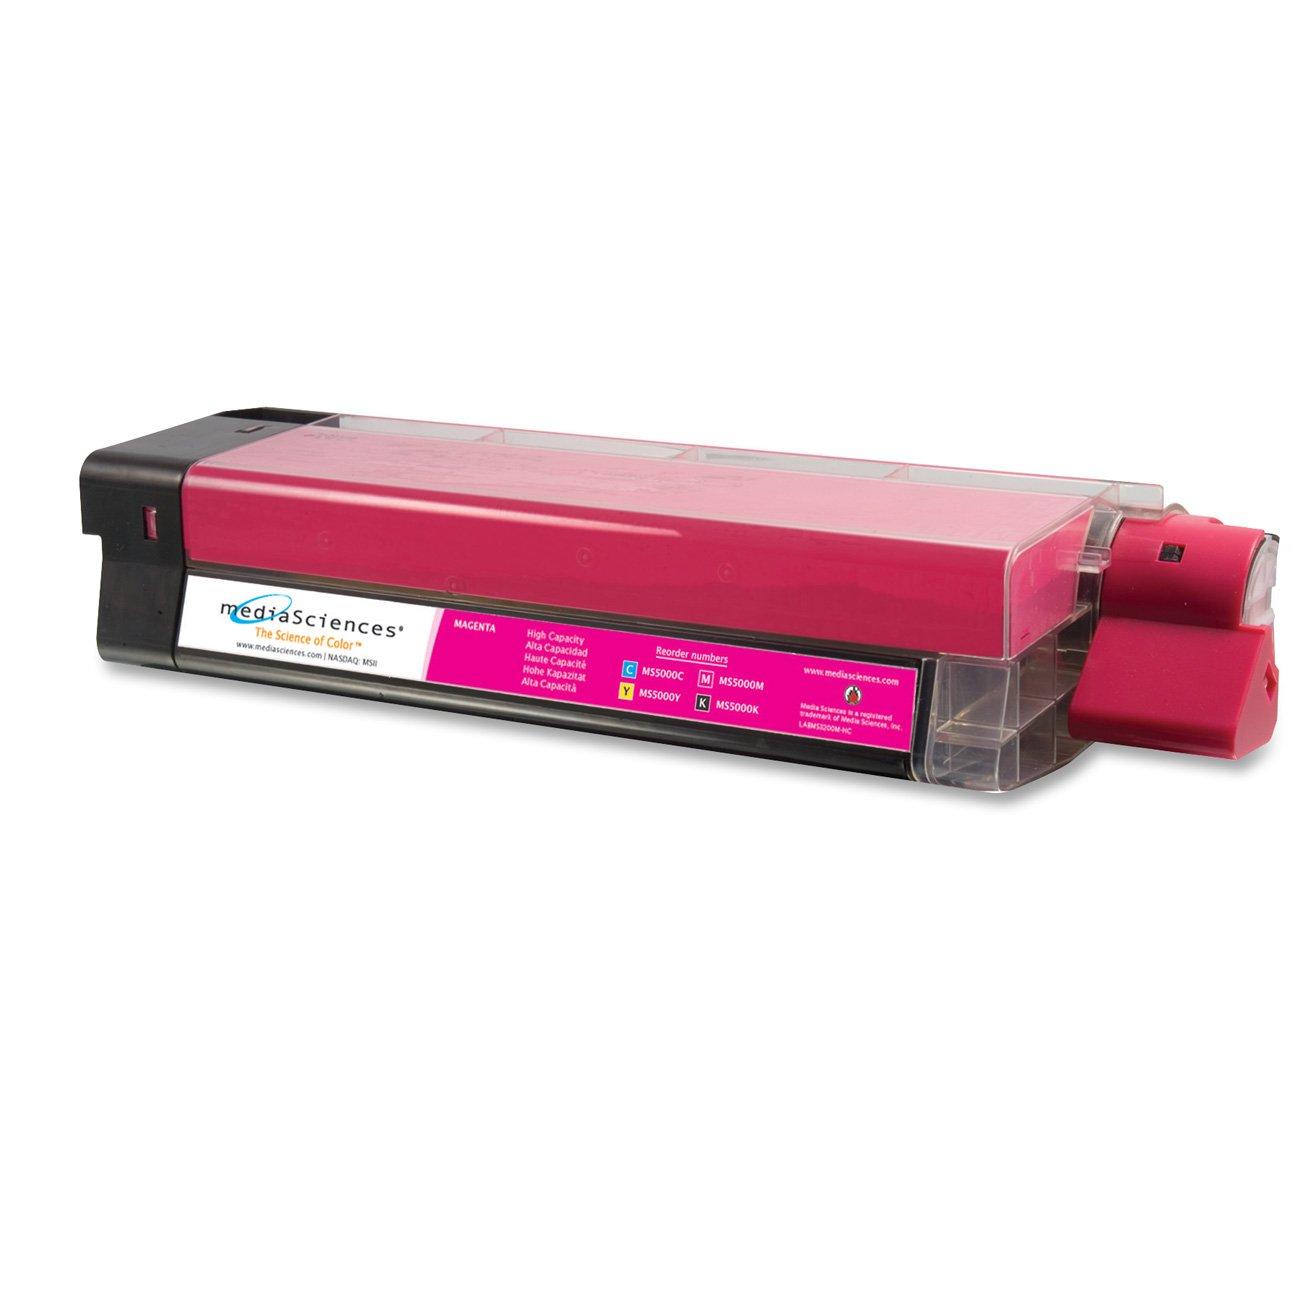 MEDIA SCIENCES MS5000M Laser toner, okidata c5000 series, 42127402 compatible, magenta